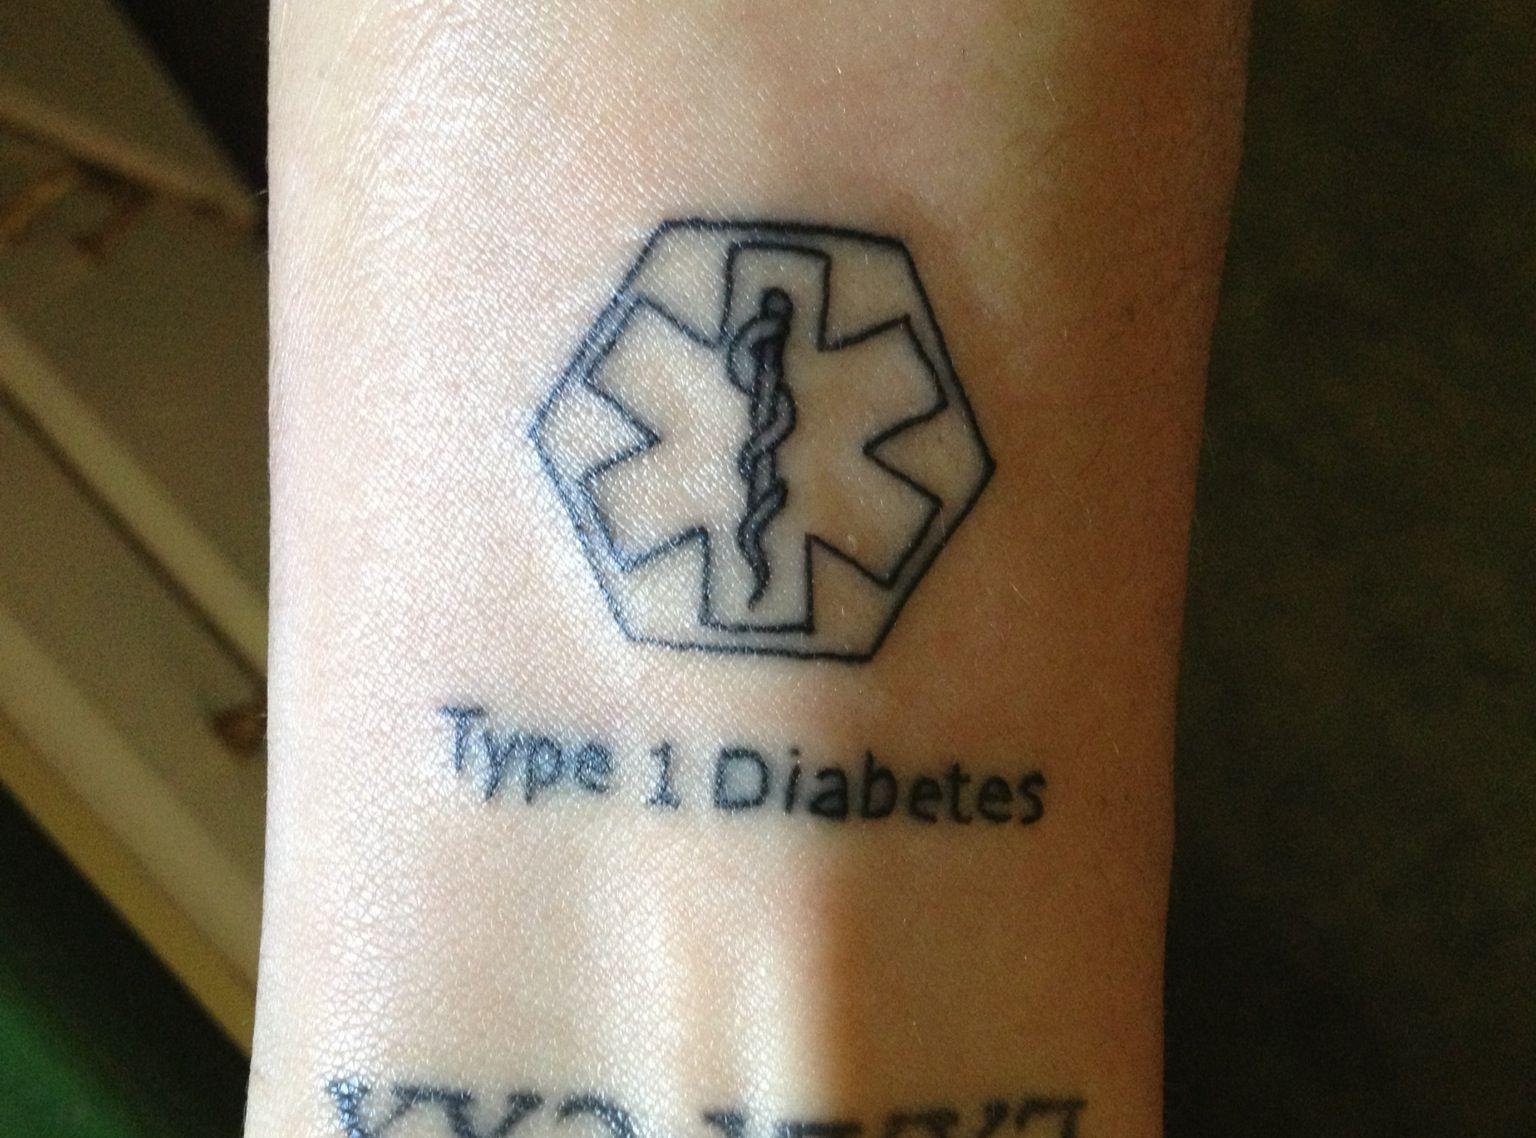 Diabetes Video Funny